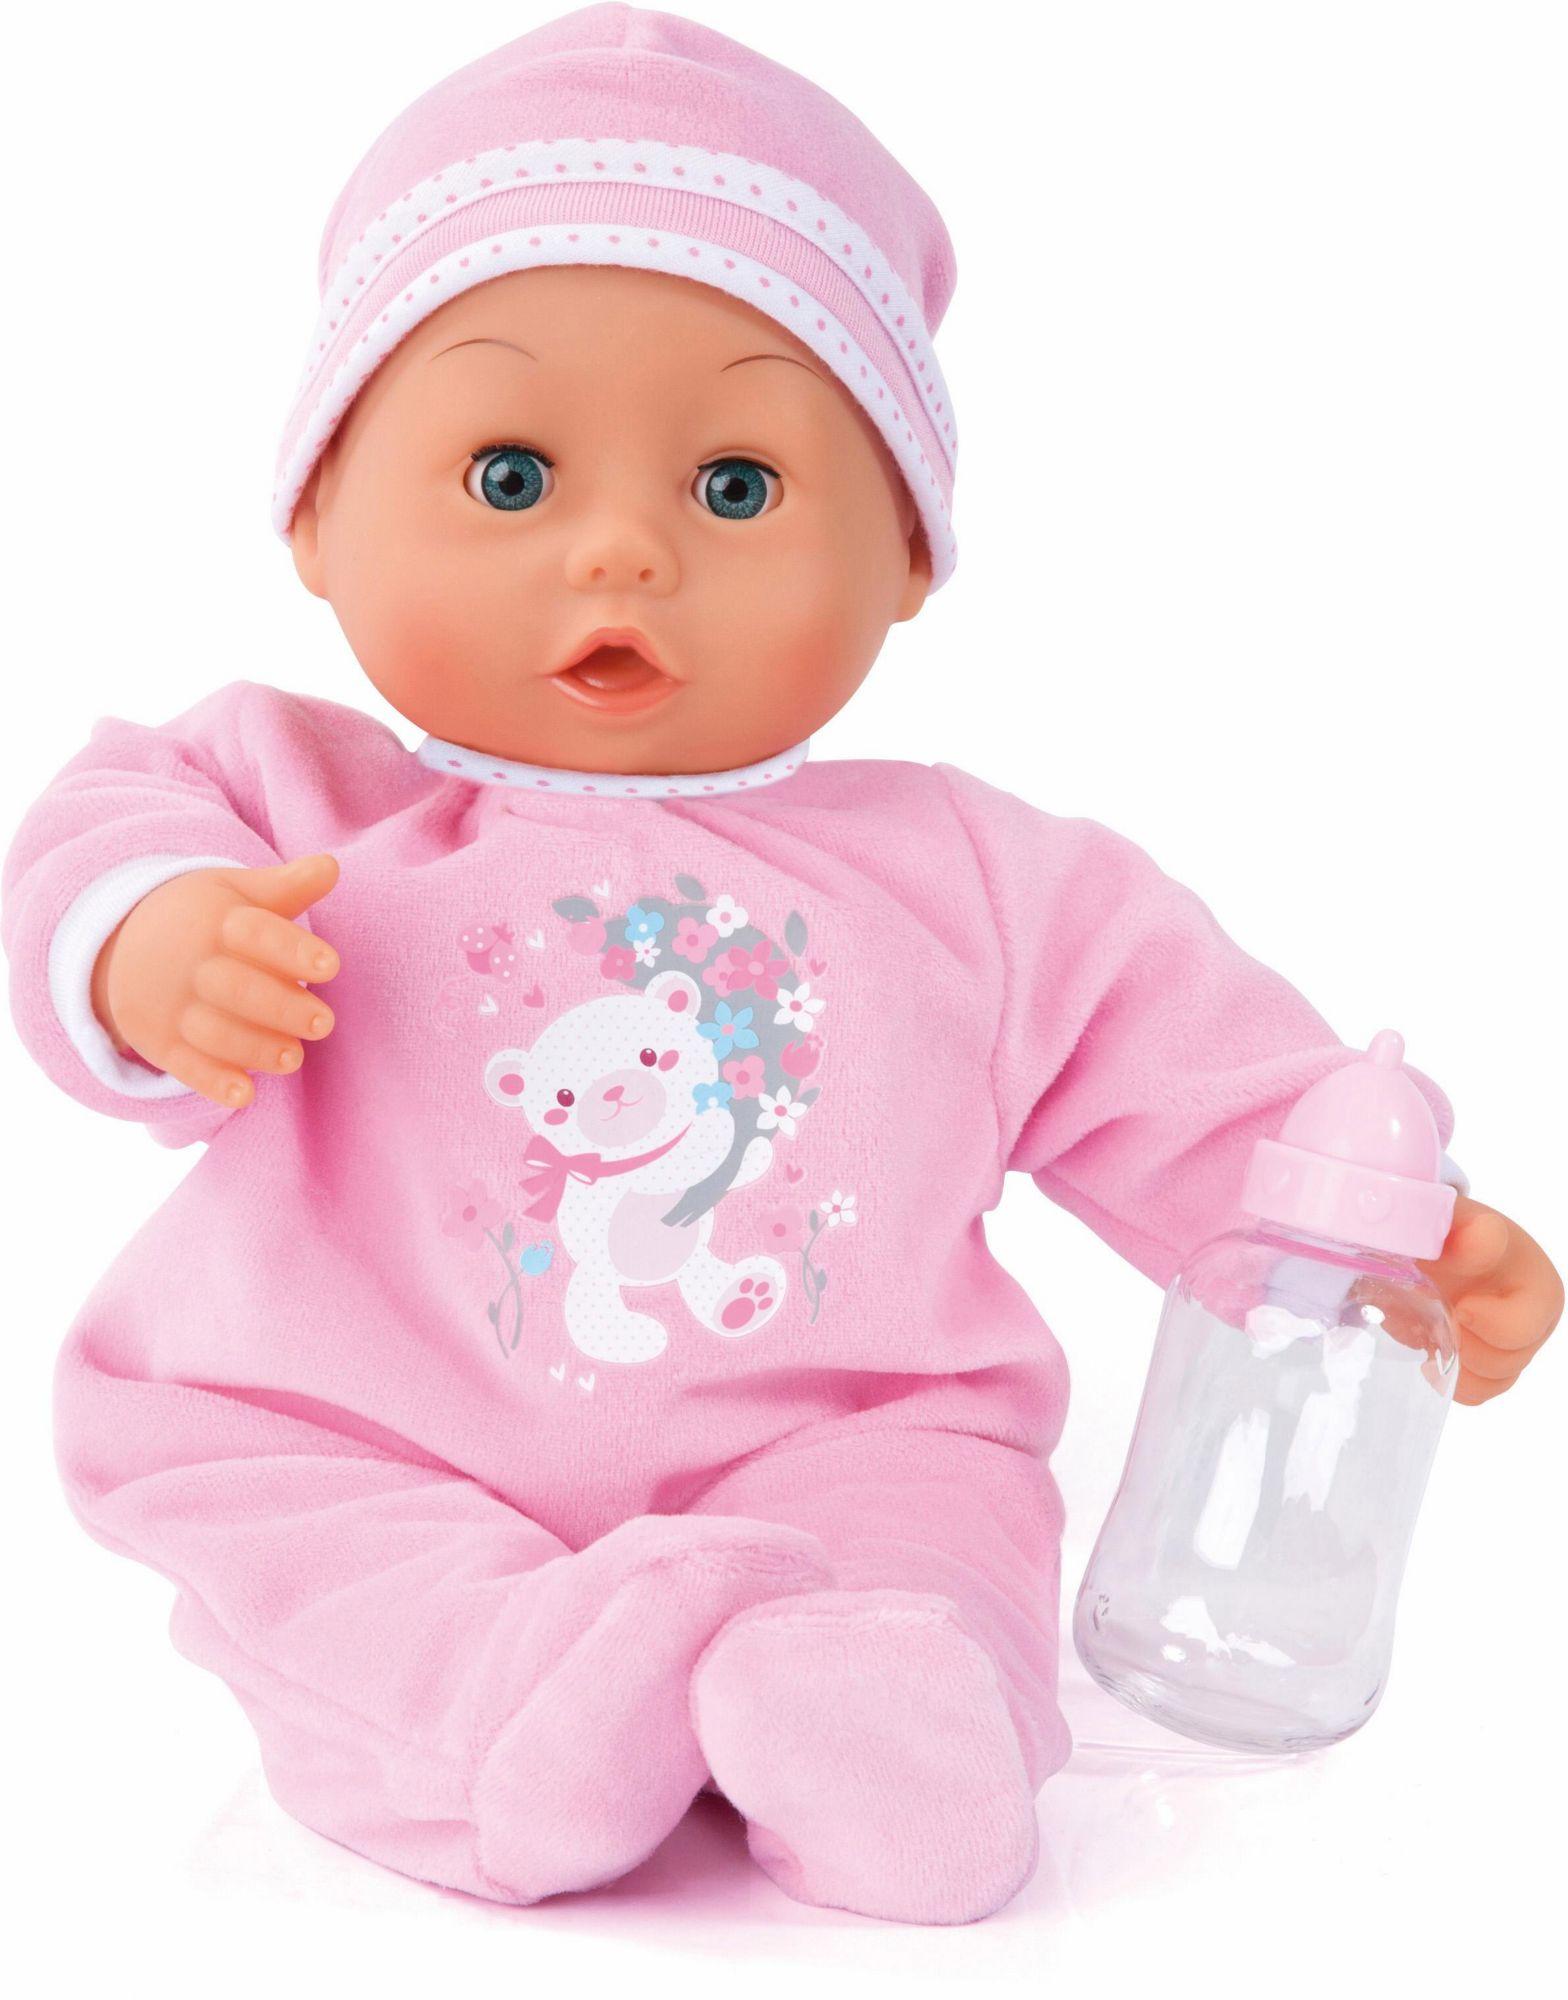 BAYER Bayer Design Babypuppe mit Funktion , »Happy Piccolina, 38 cm«